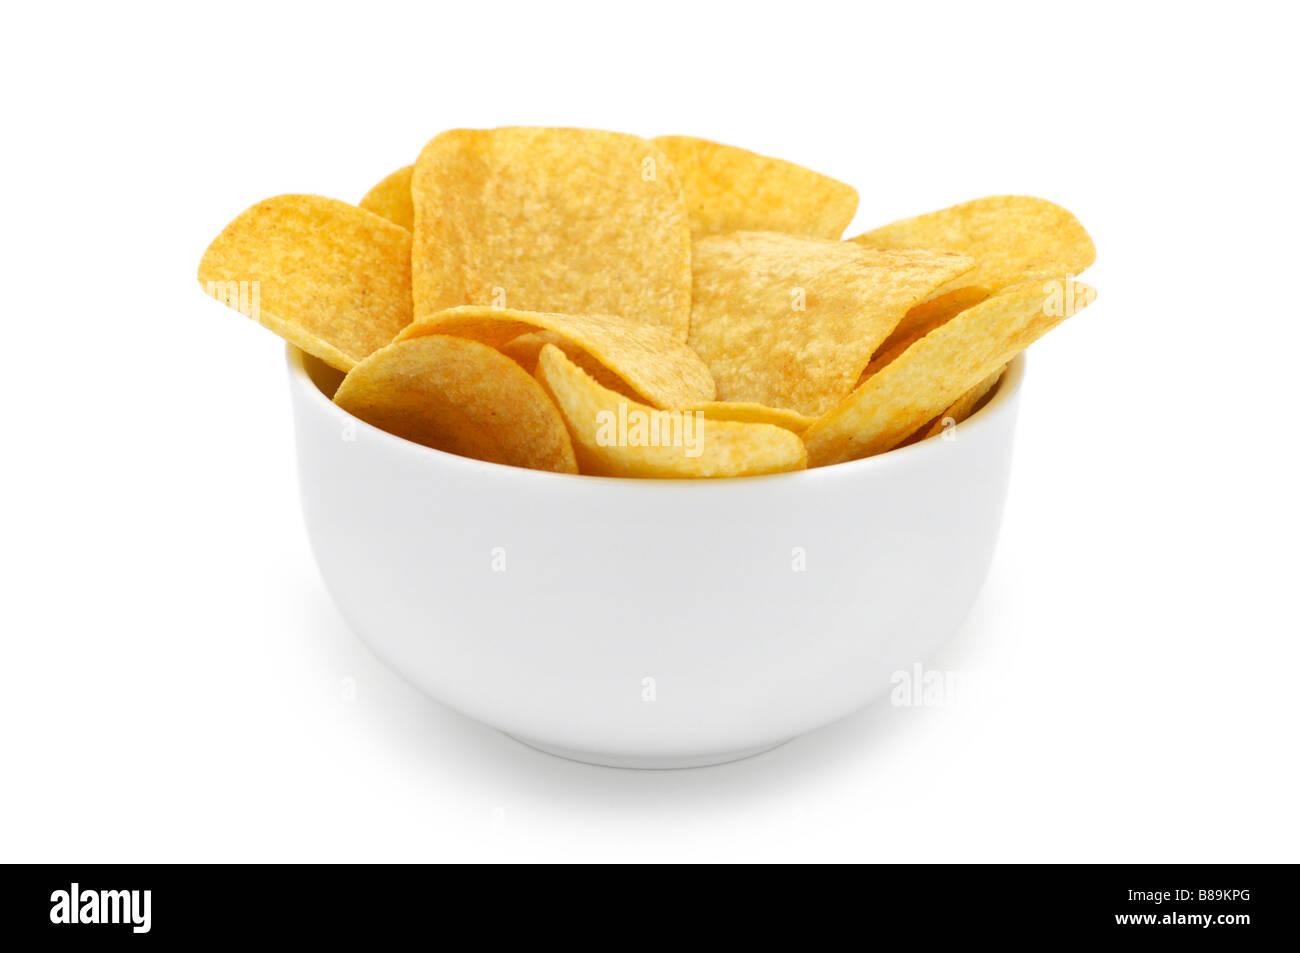 Bowl of Potato Crisps/Chips - Stock Image